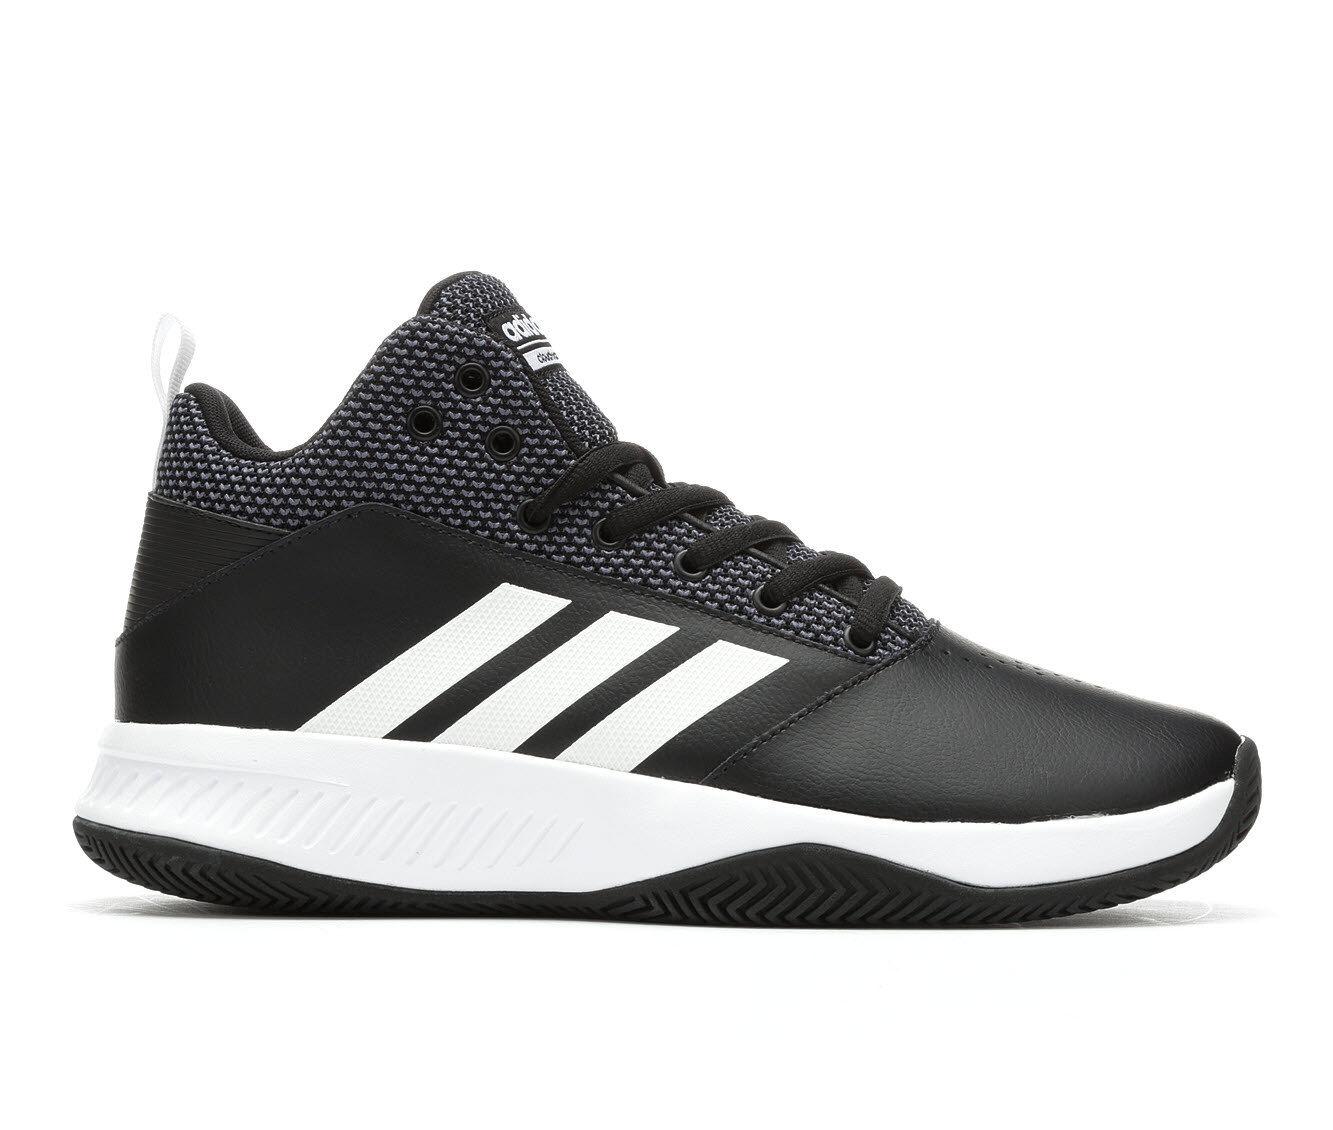 Adidas NEO Cloudfoam Advantage CL  CG5792  Men Casual Shoes Black Silver b439f3999